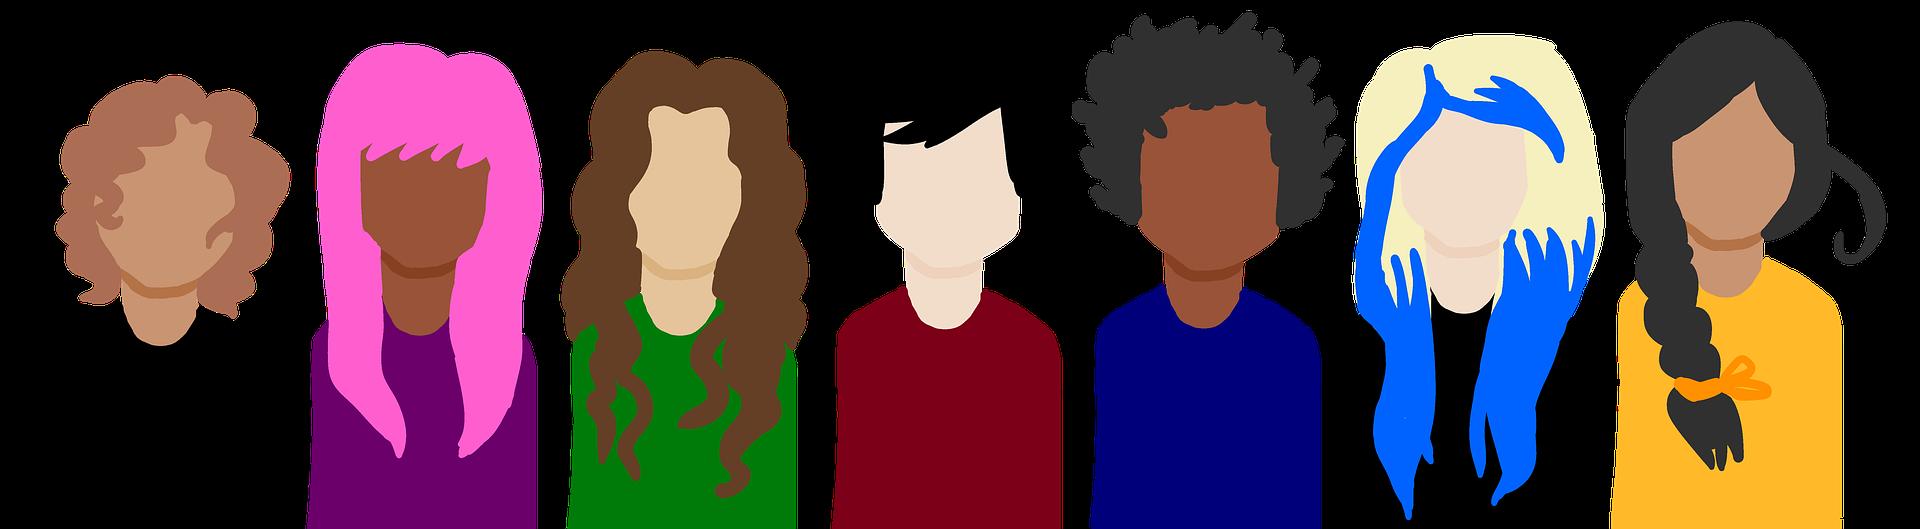 Nodisorder-avatar-team